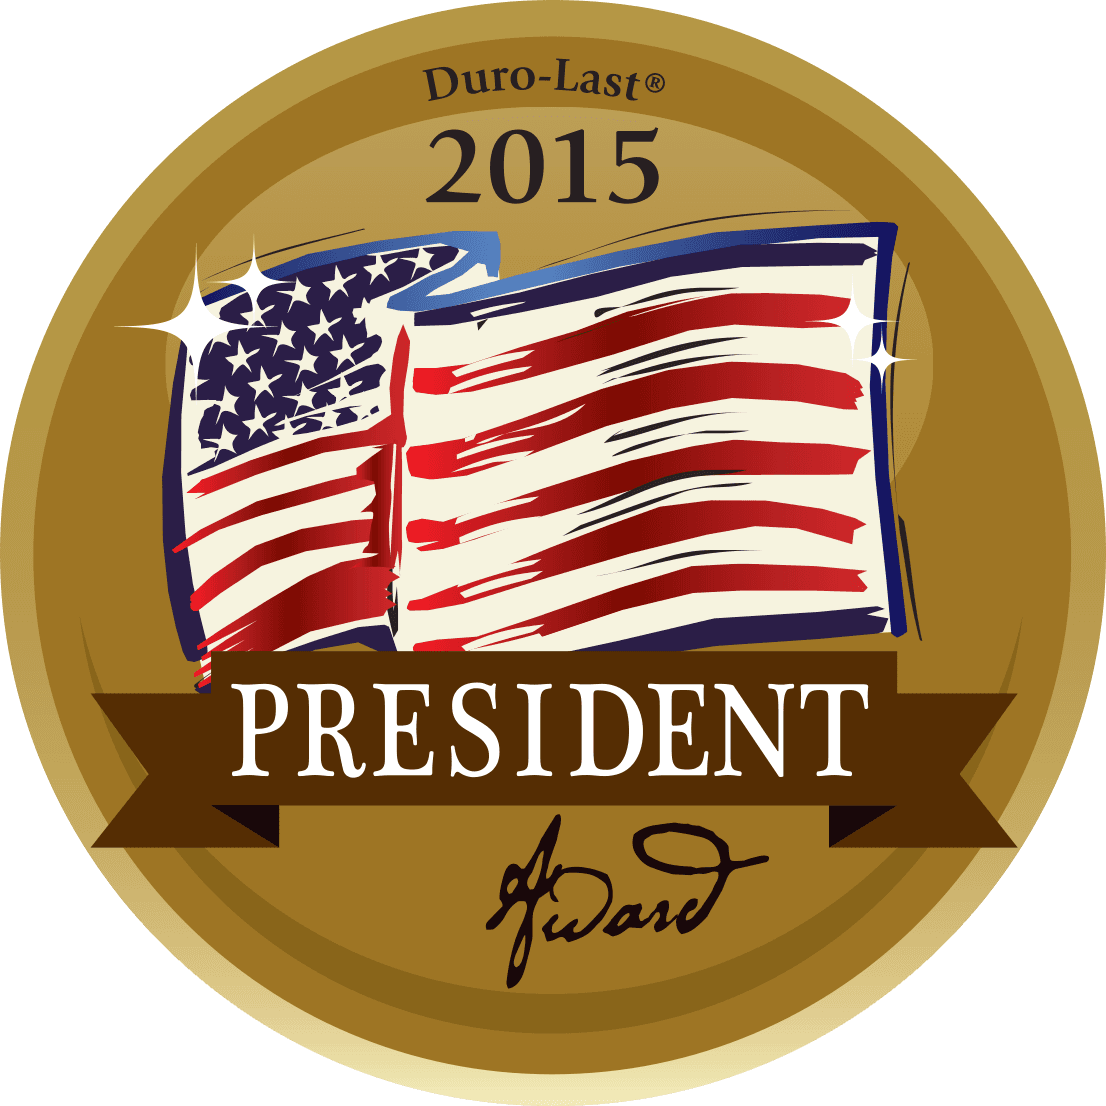 Duro-Last President Award